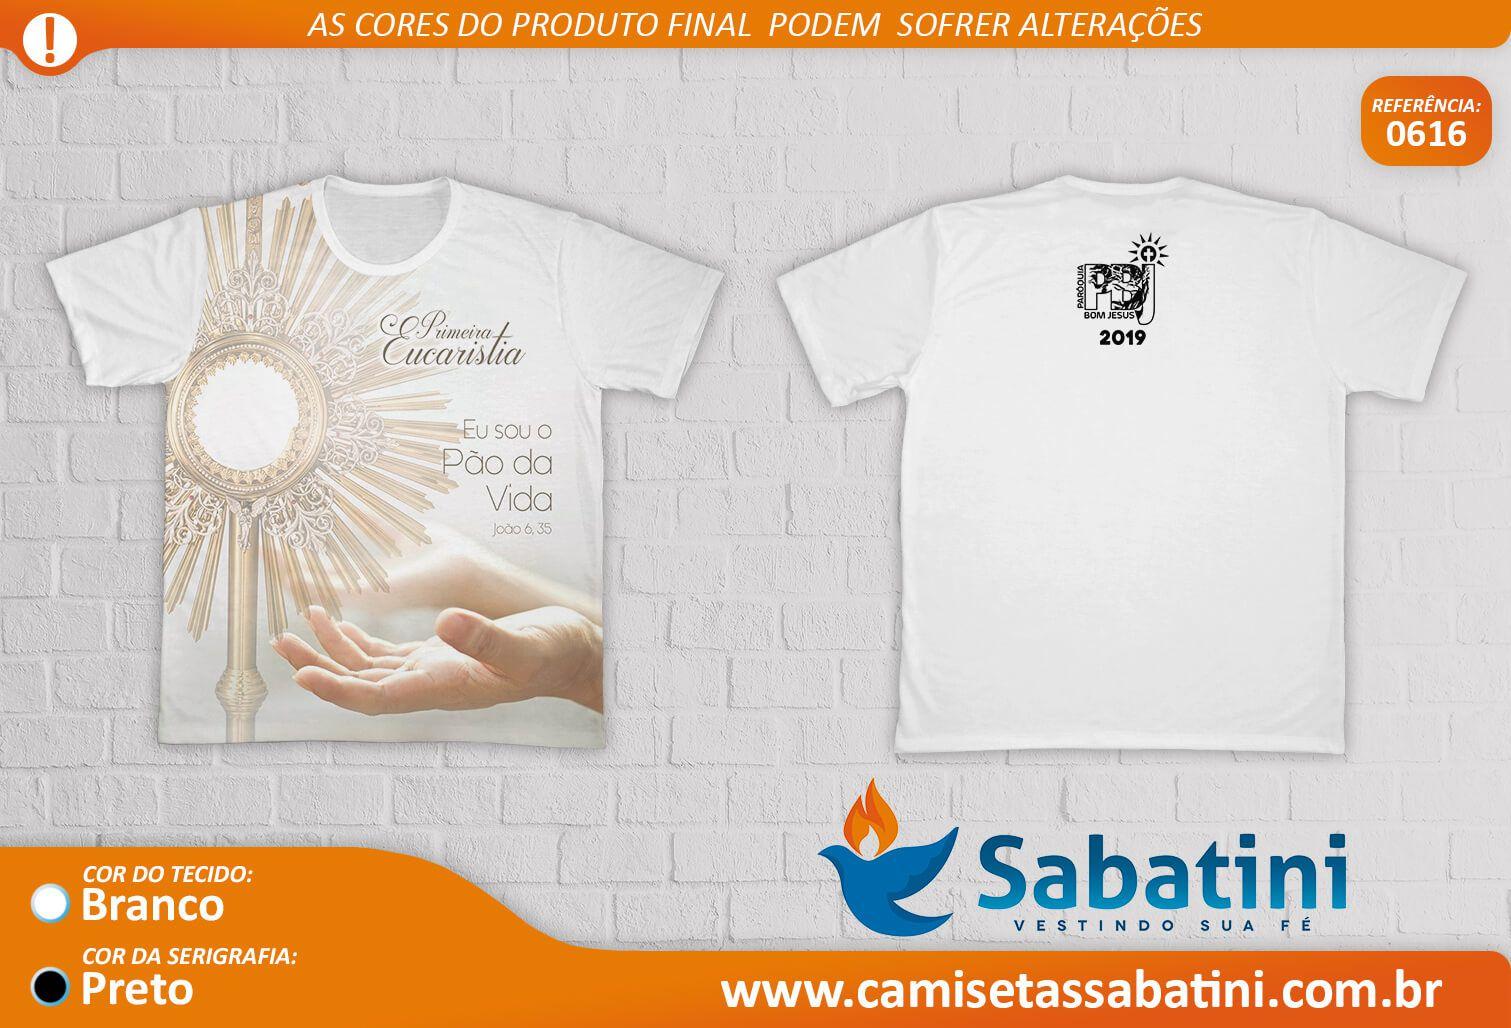 Camiseta Personalizada - EUCARISTIA- DOURADOS - MS - ID:14749109  - Camisetas Sabatini